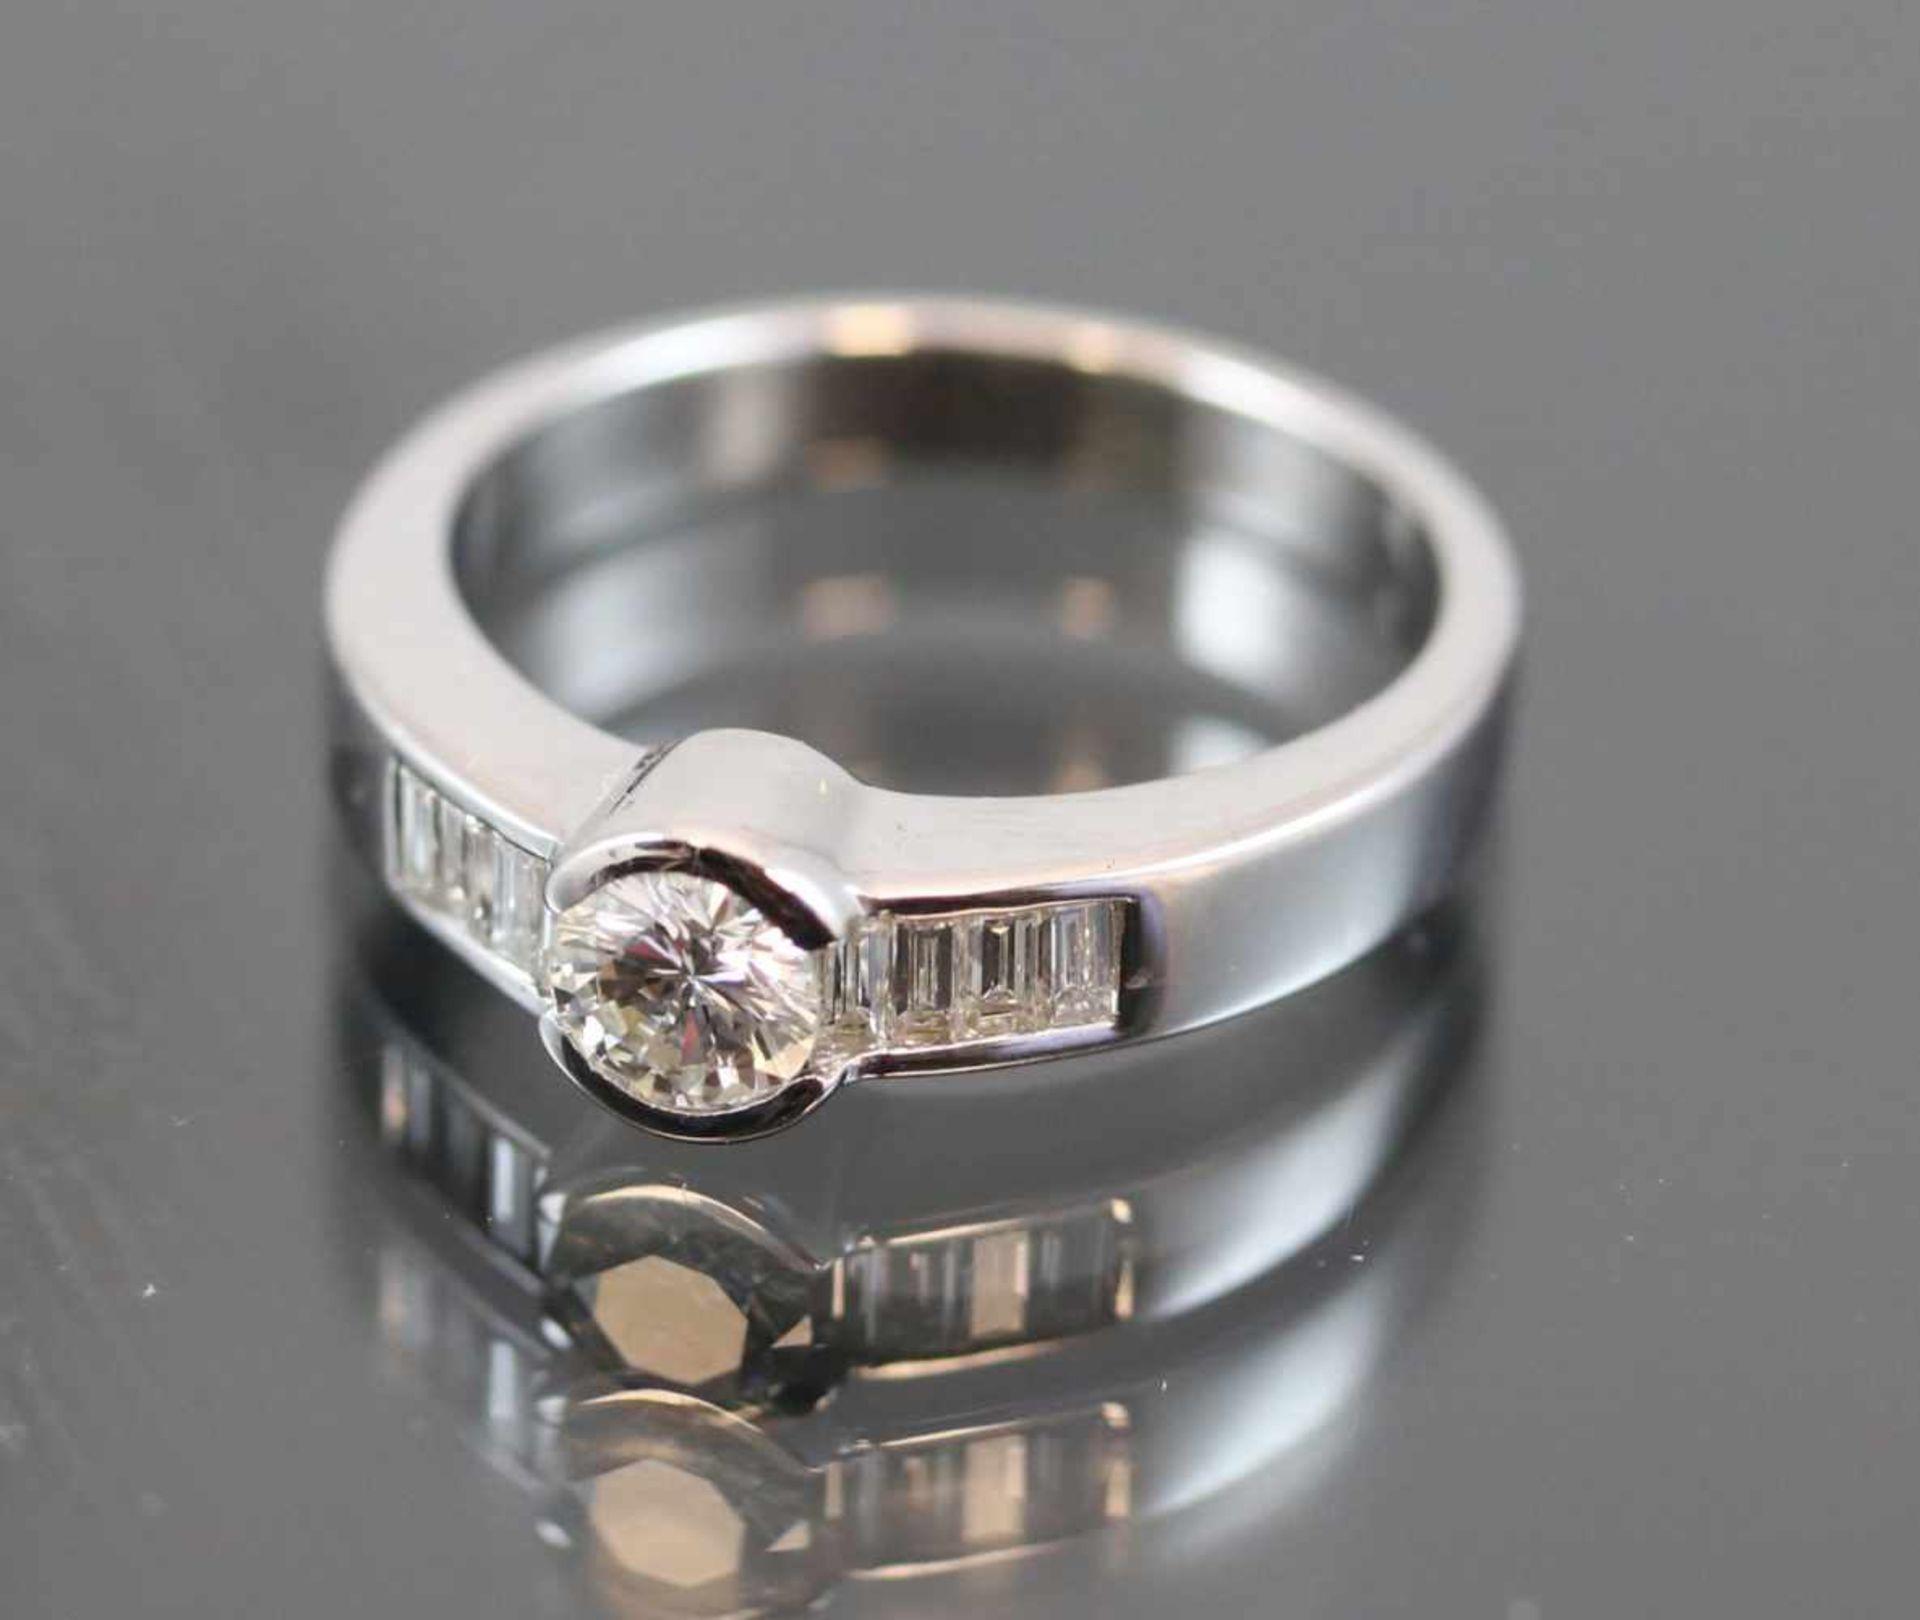 Los 40 - Brillant-Diamant-Ring, 750 Weißgold6,4 Gramm 1 Brillant, 0,45 ct., tw/vvsi. Ringgröße: 568 Diamanten